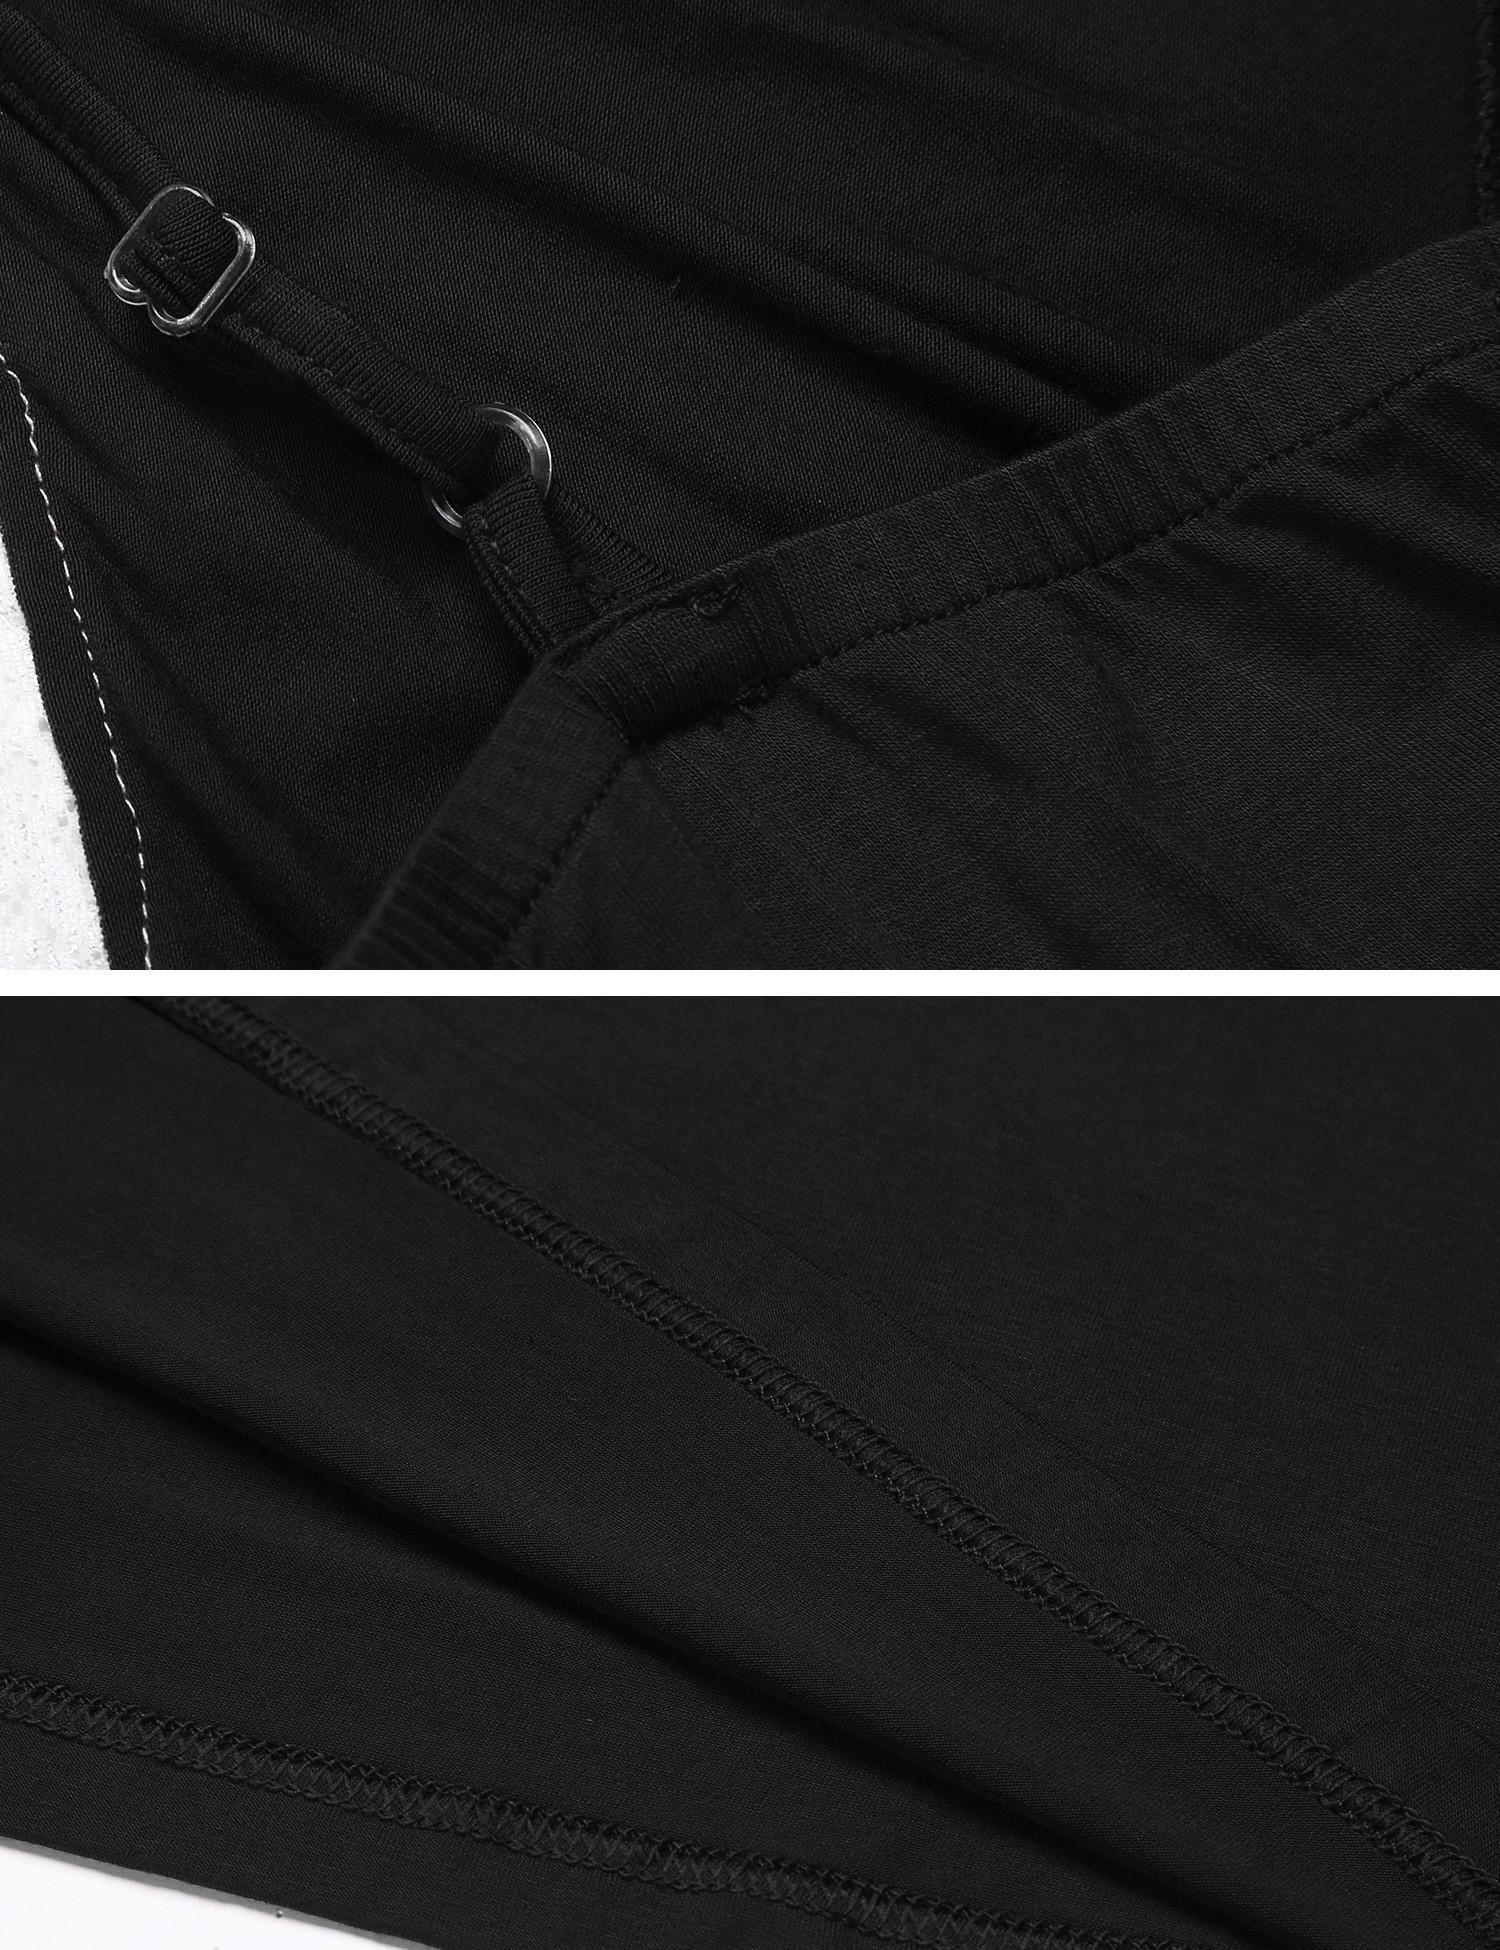 MAXMODA Womens Sleepwear Cotton Pajama Cami Set Sexy Nightwear (Black L) by MAXMODA (Image #6)